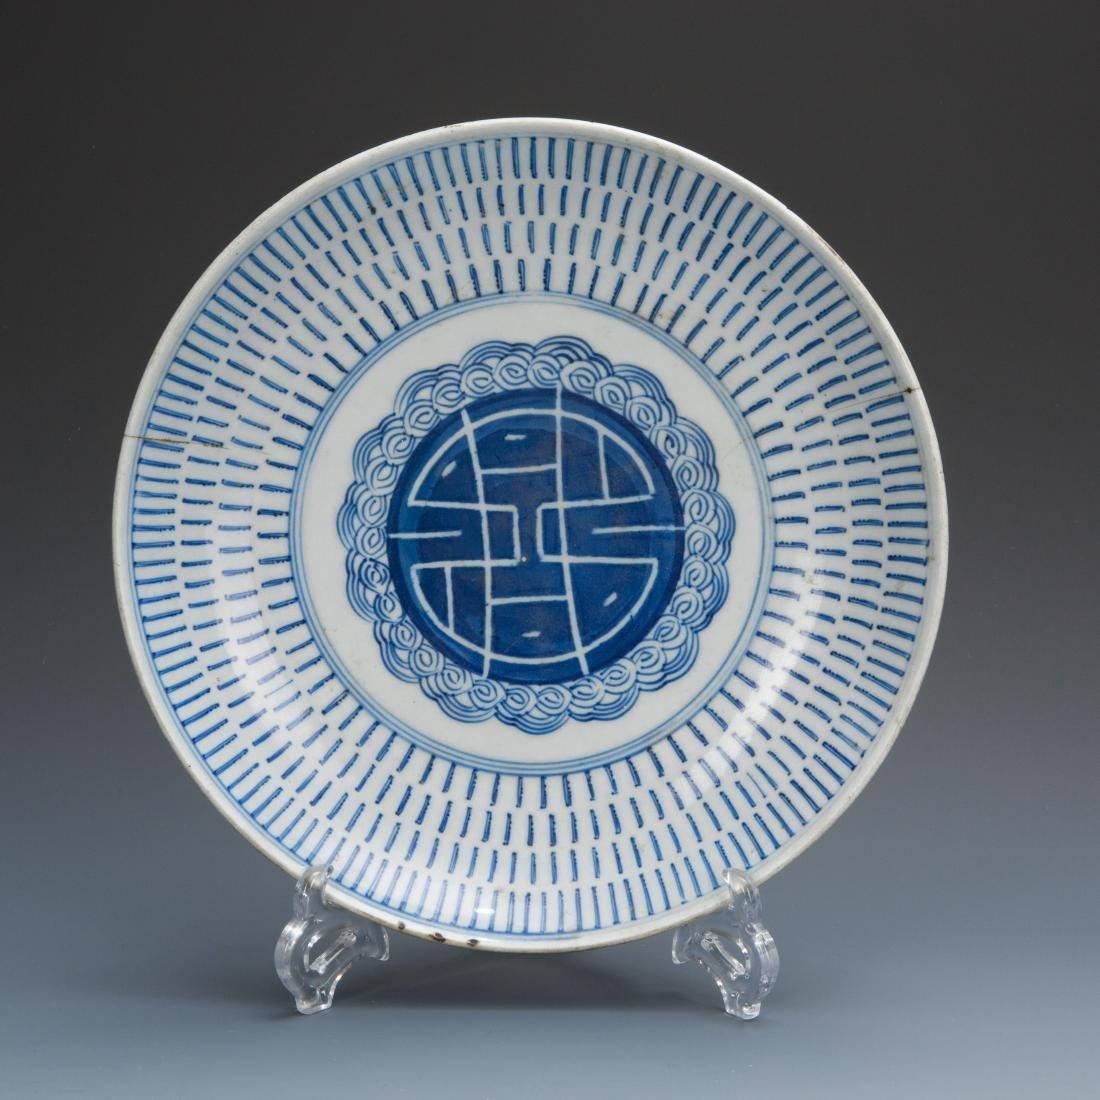 Estate Sale: 3pc Set of Porcelain Plates and Disk - 2